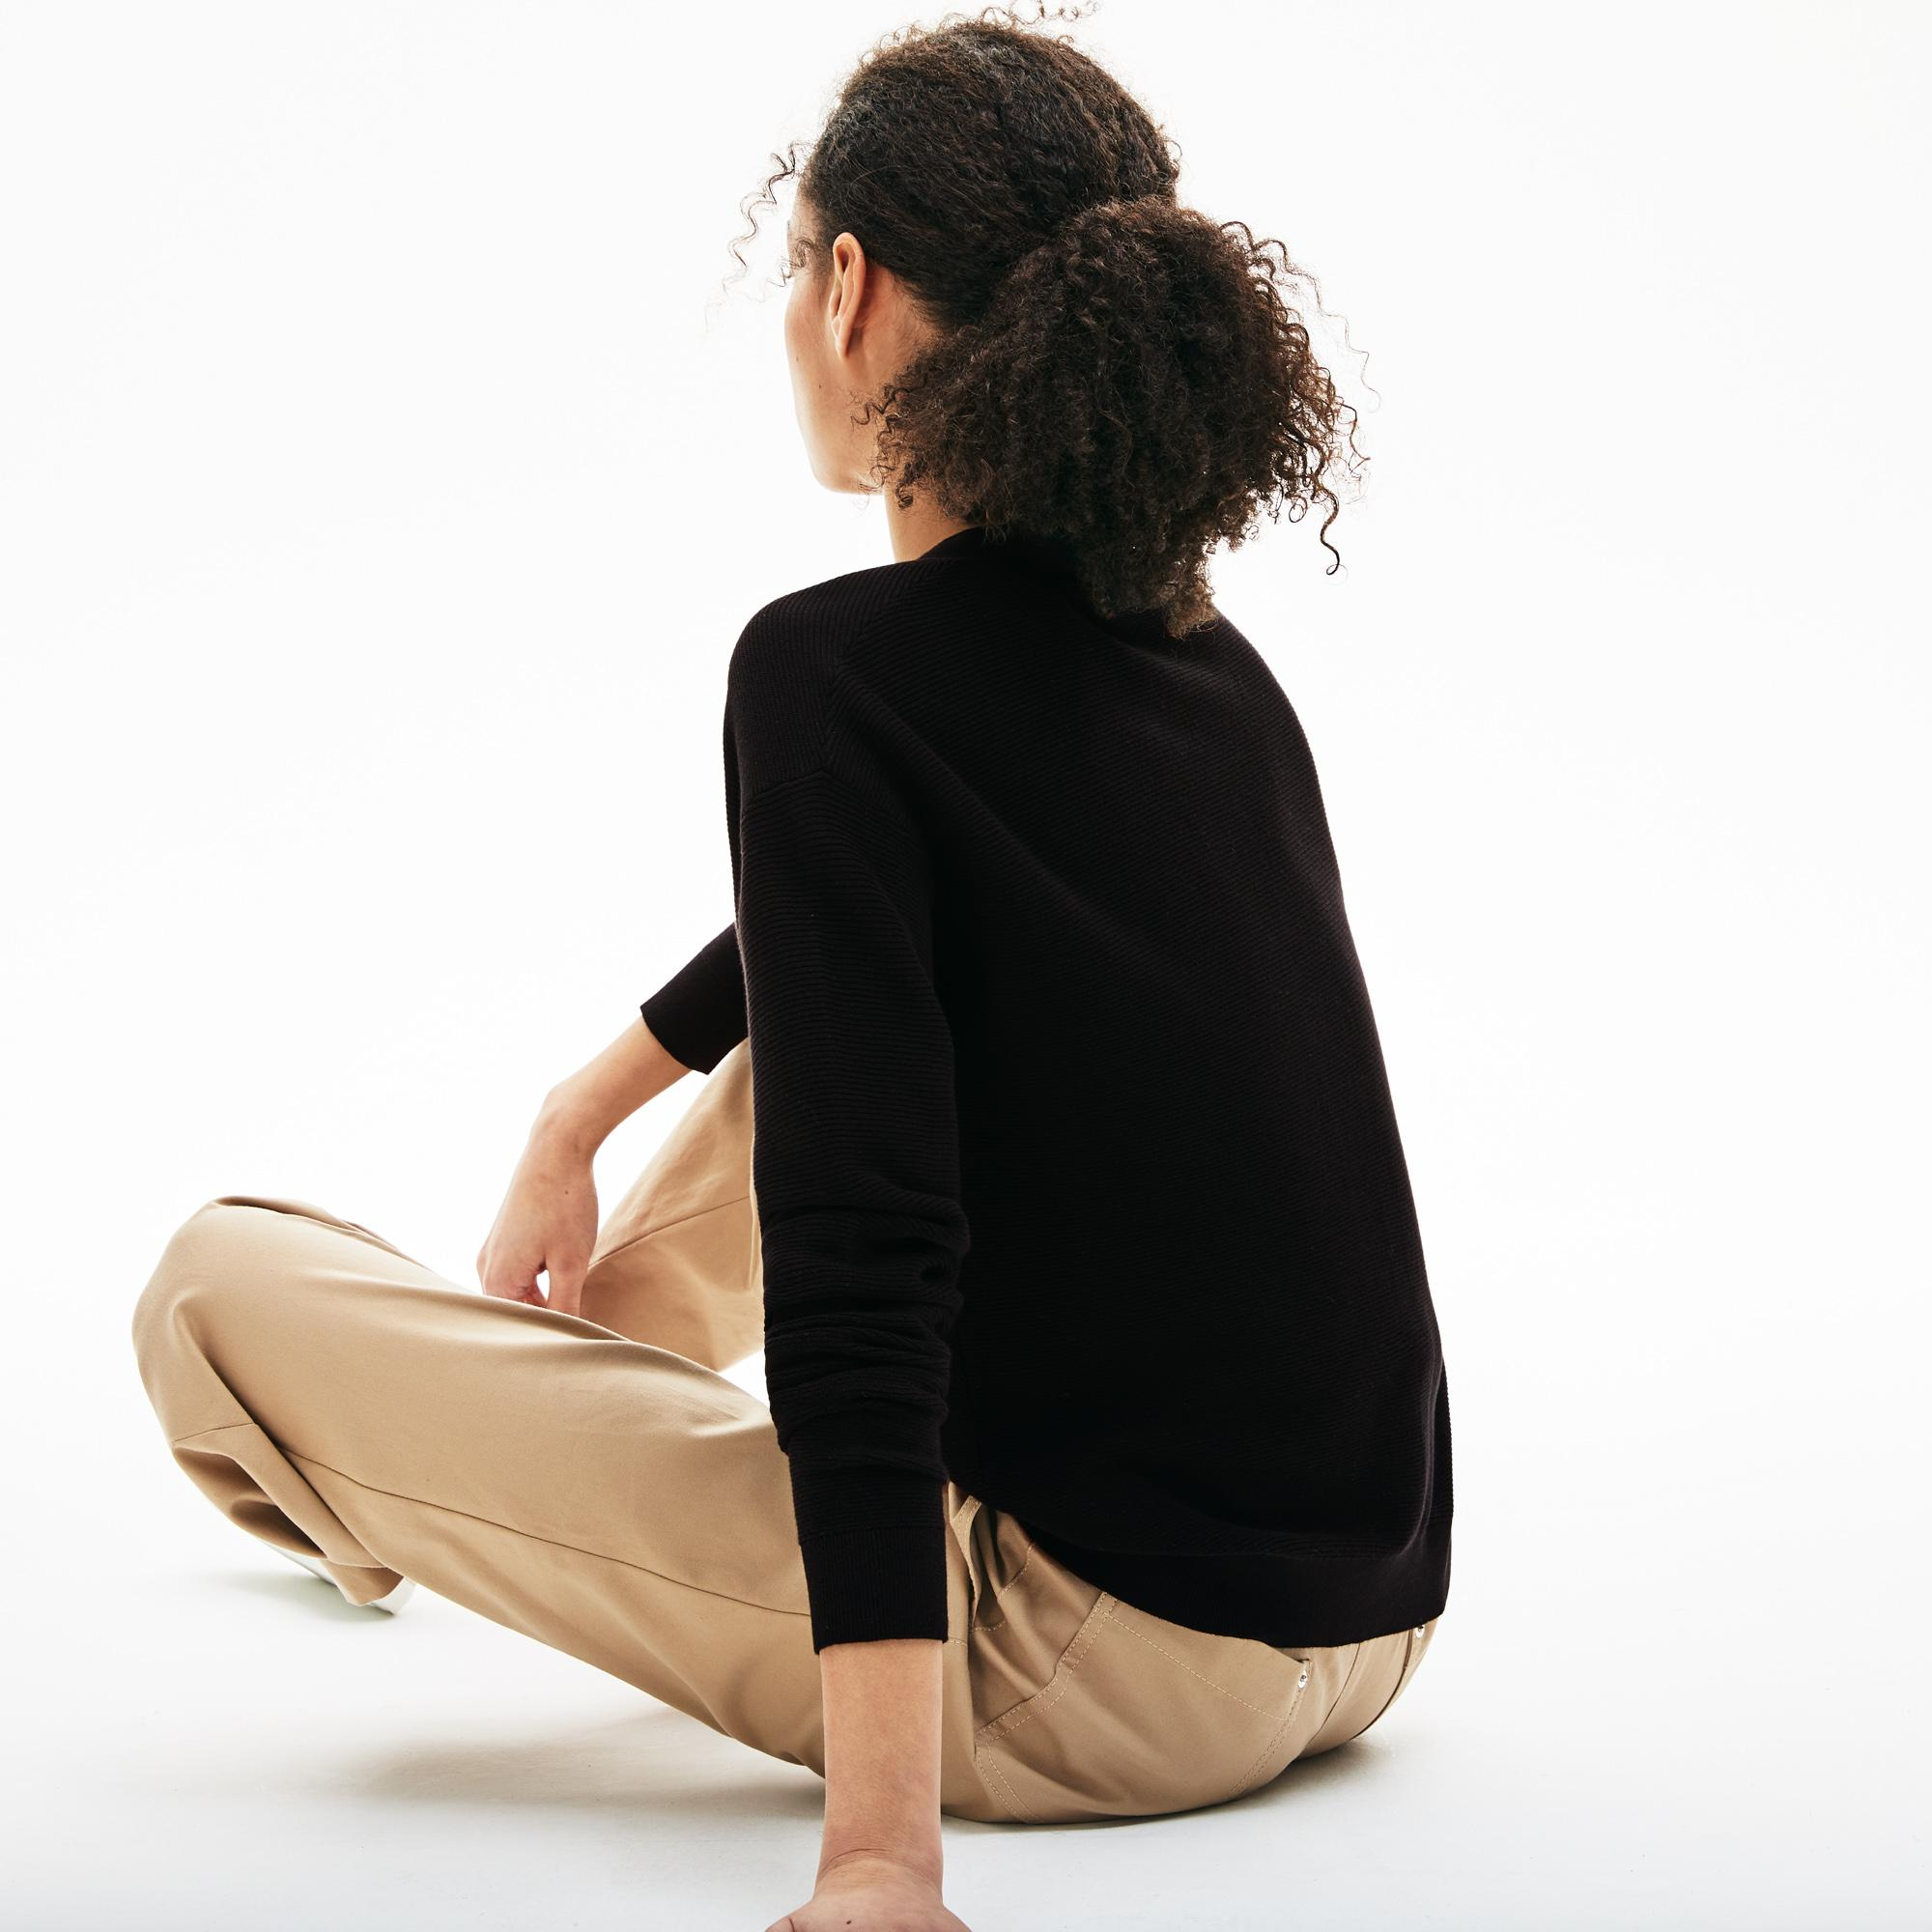 Lacoste Kadın V Yaka Siyah Triko Hırka